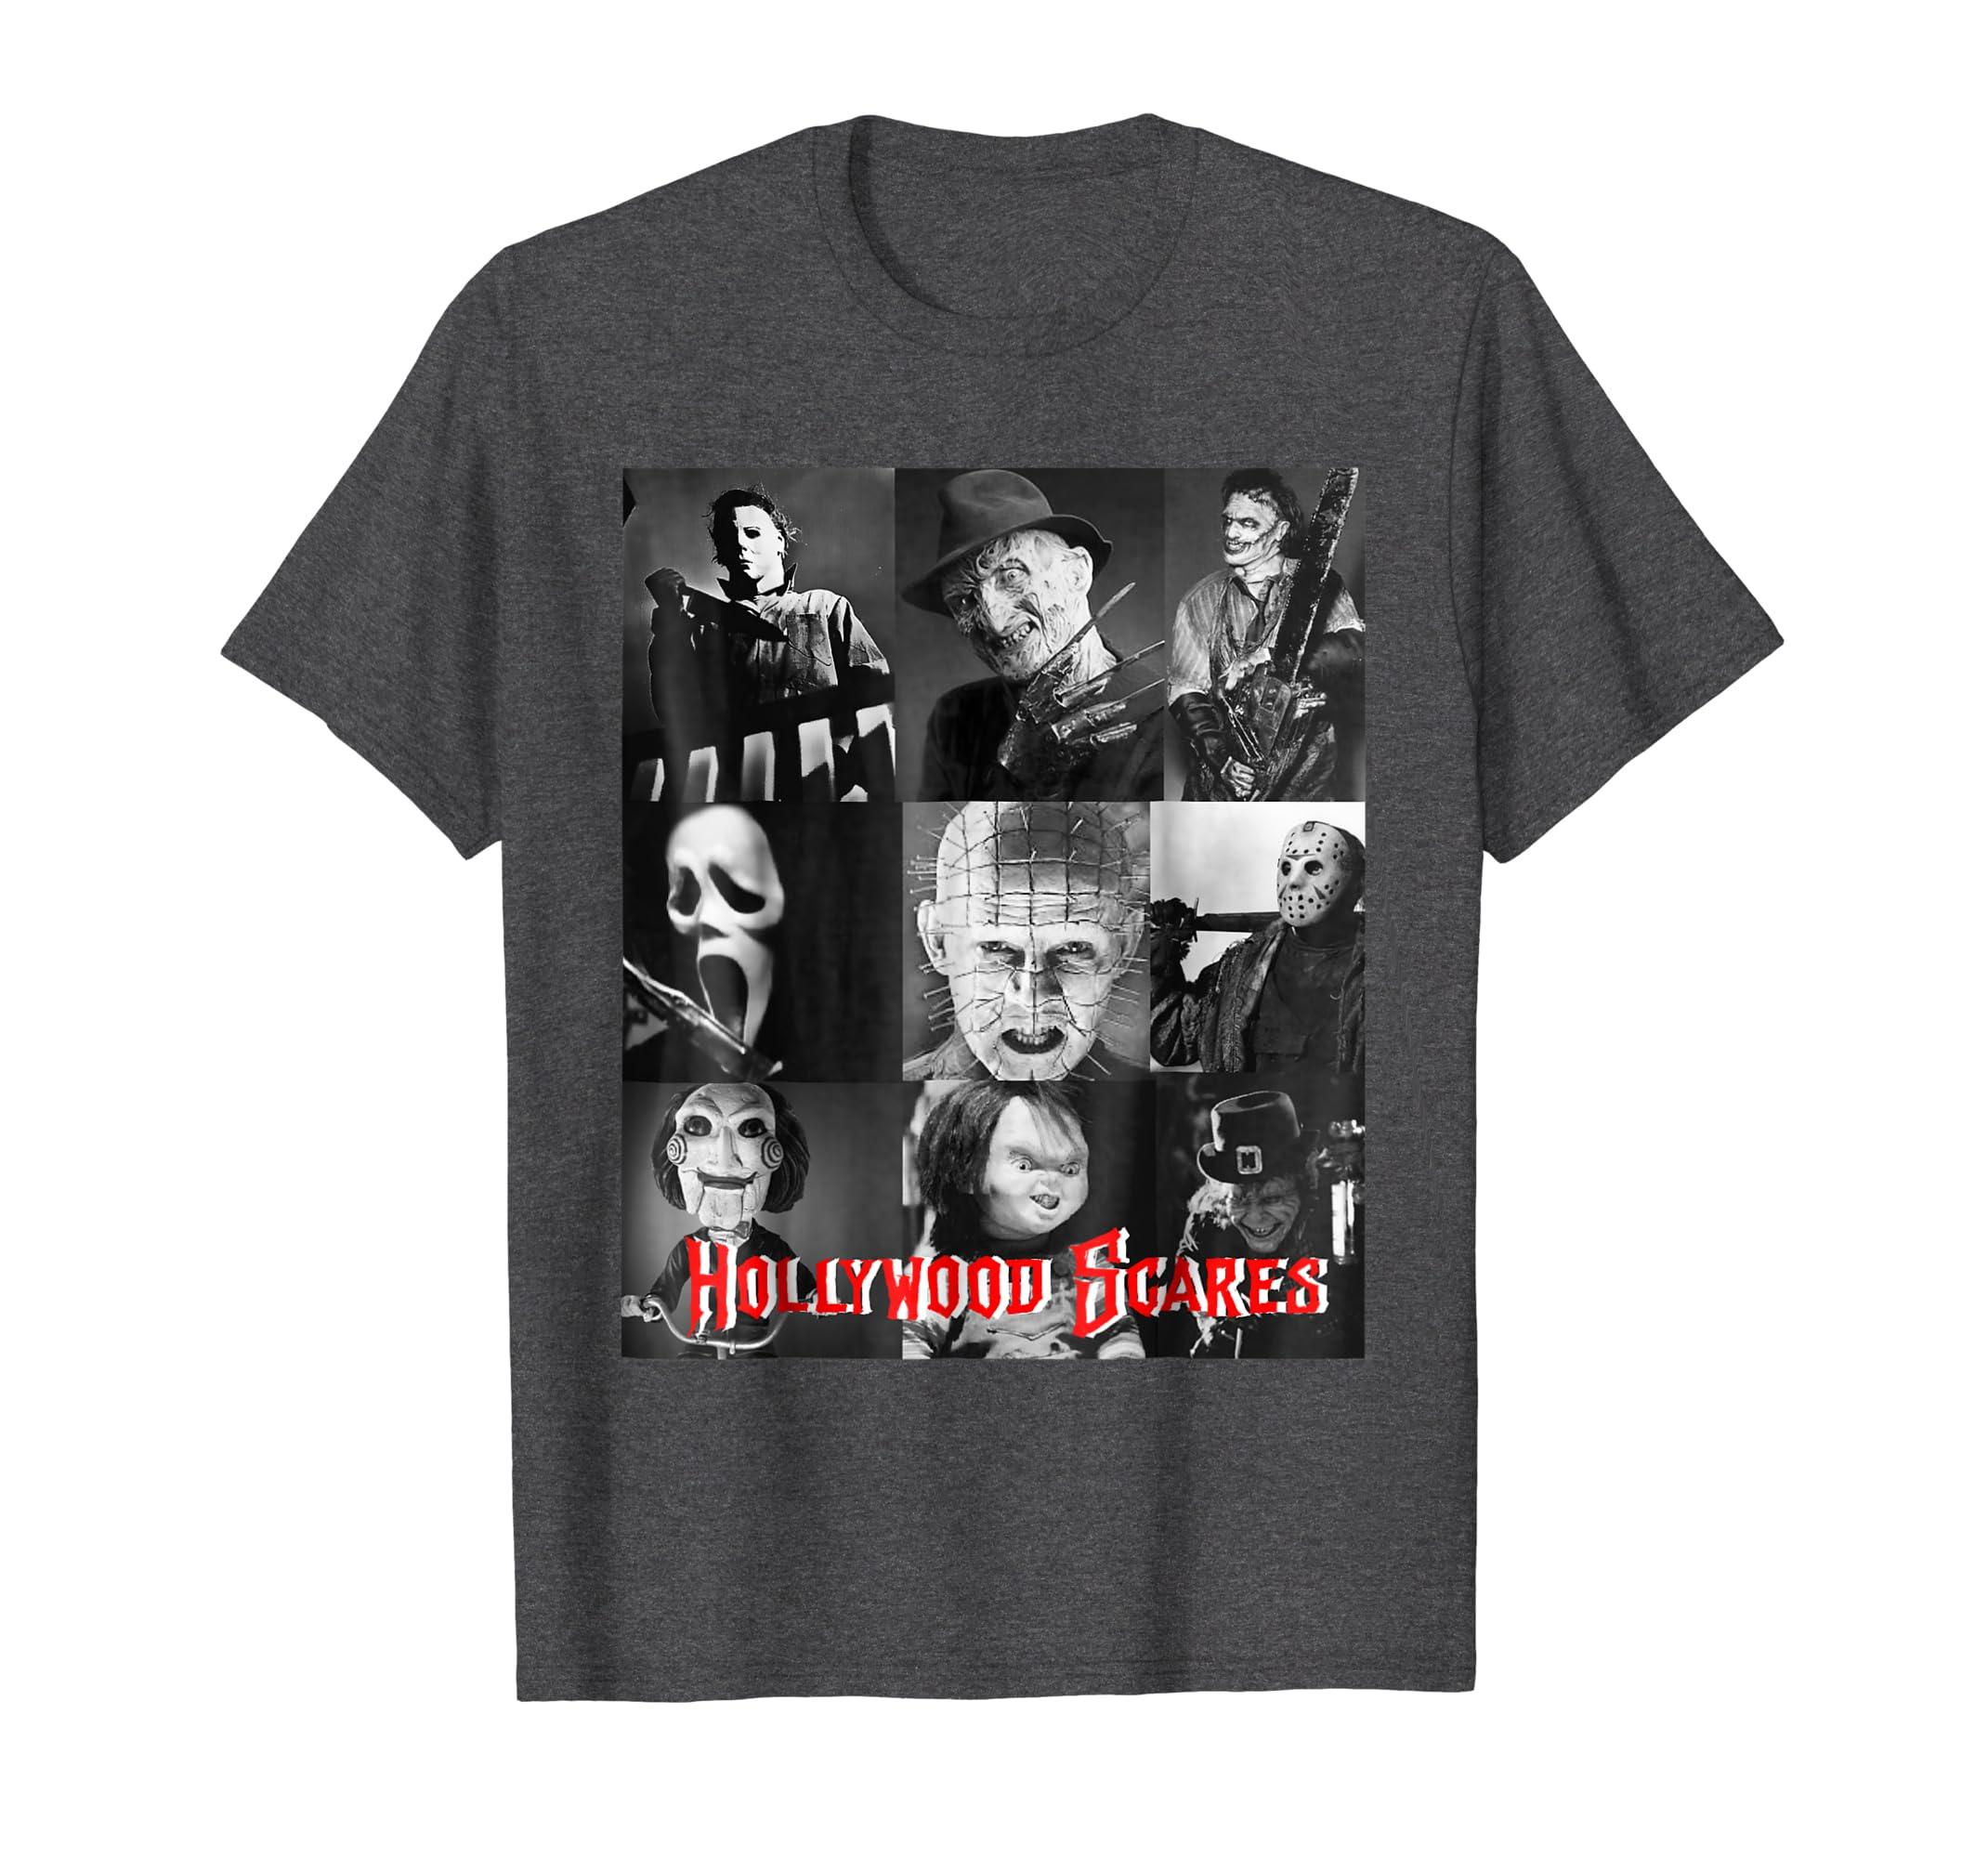 Hollywood Scares Halloween Scary Horror Shirt